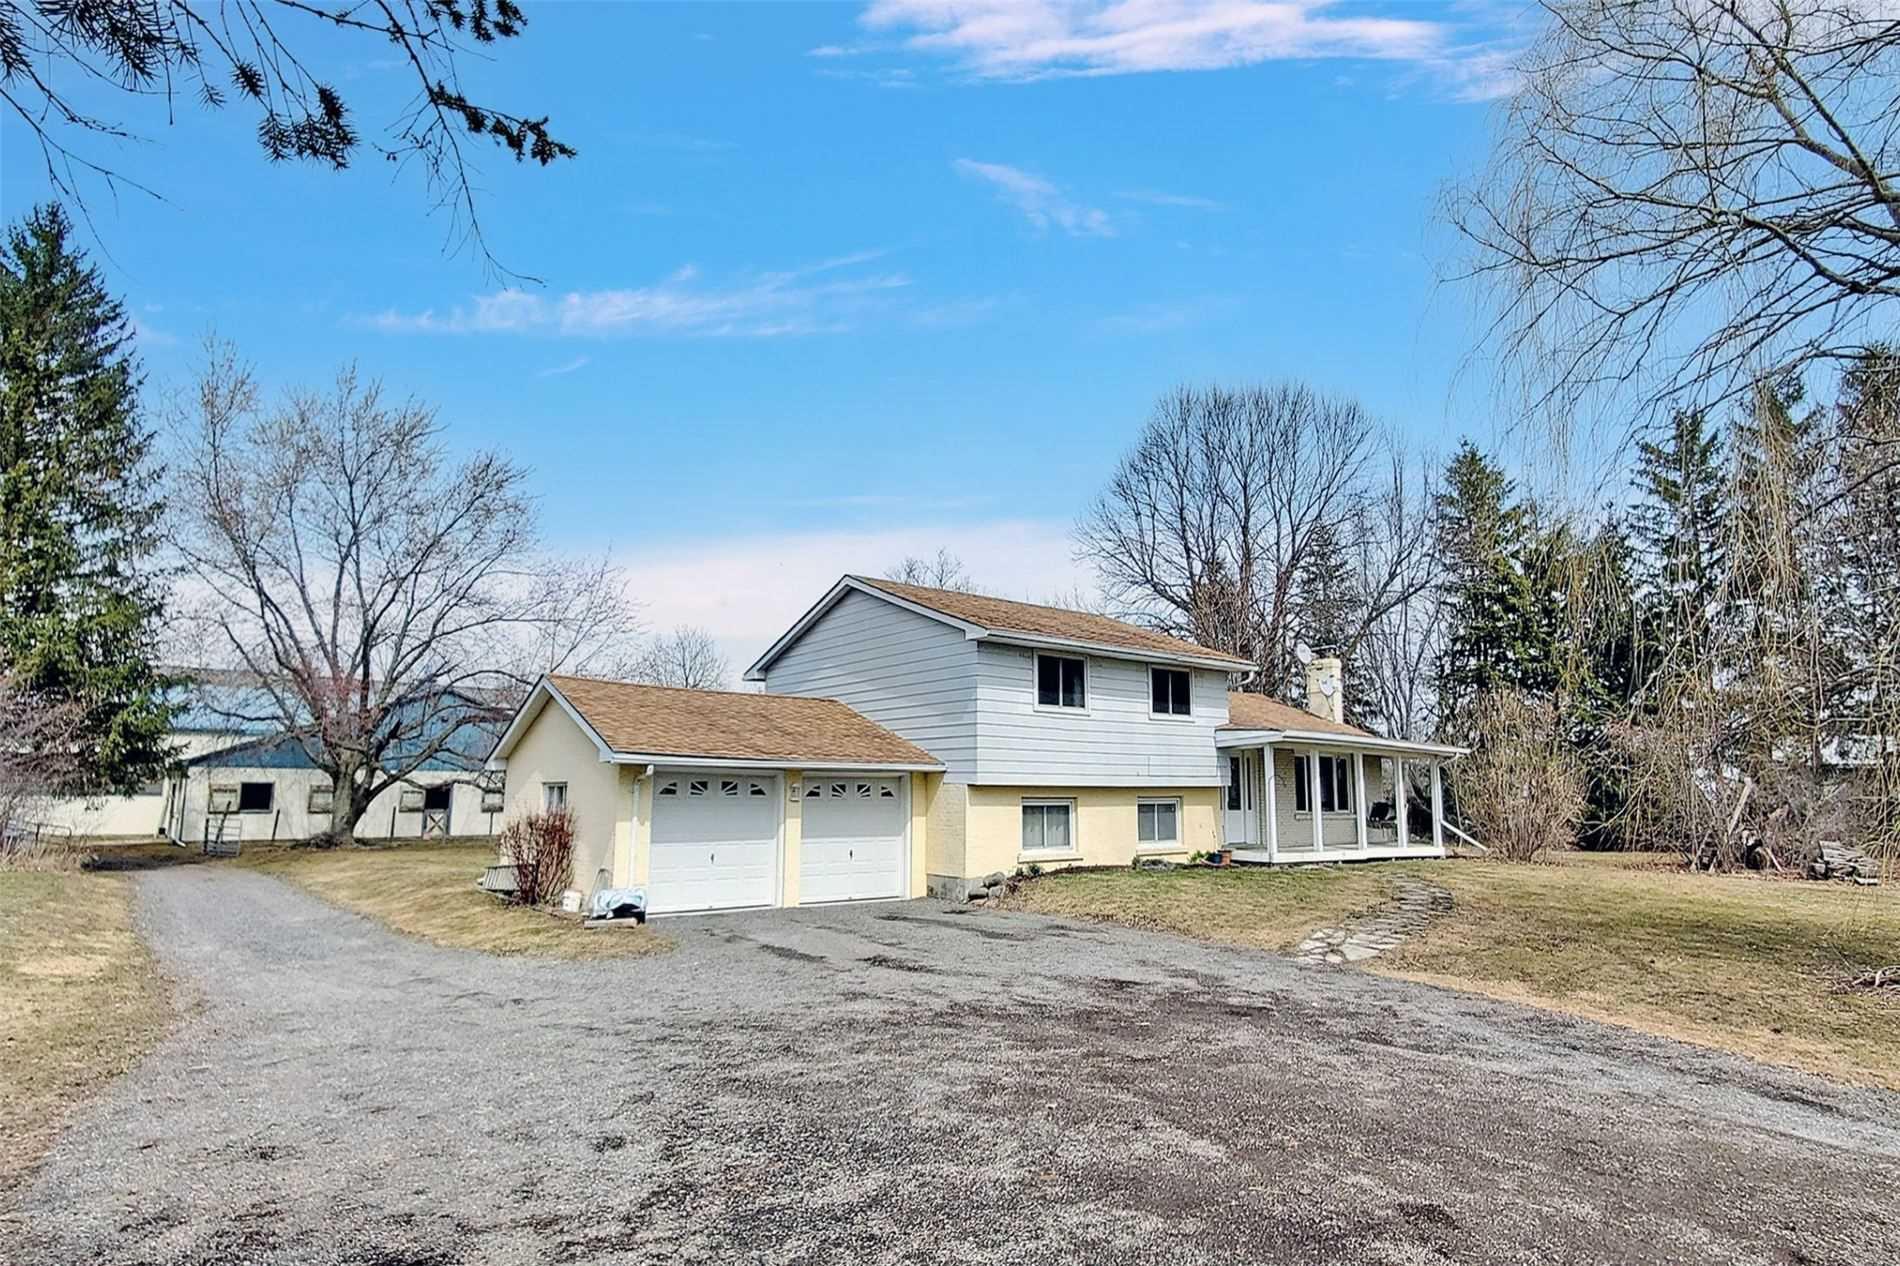 610 Ball Rd, Uxbridge, Ontario L9P1R2, 3 Bedrooms Bedrooms, ,3 BathroomsBathrooms,Farm,For Sale,Ball,N5168808